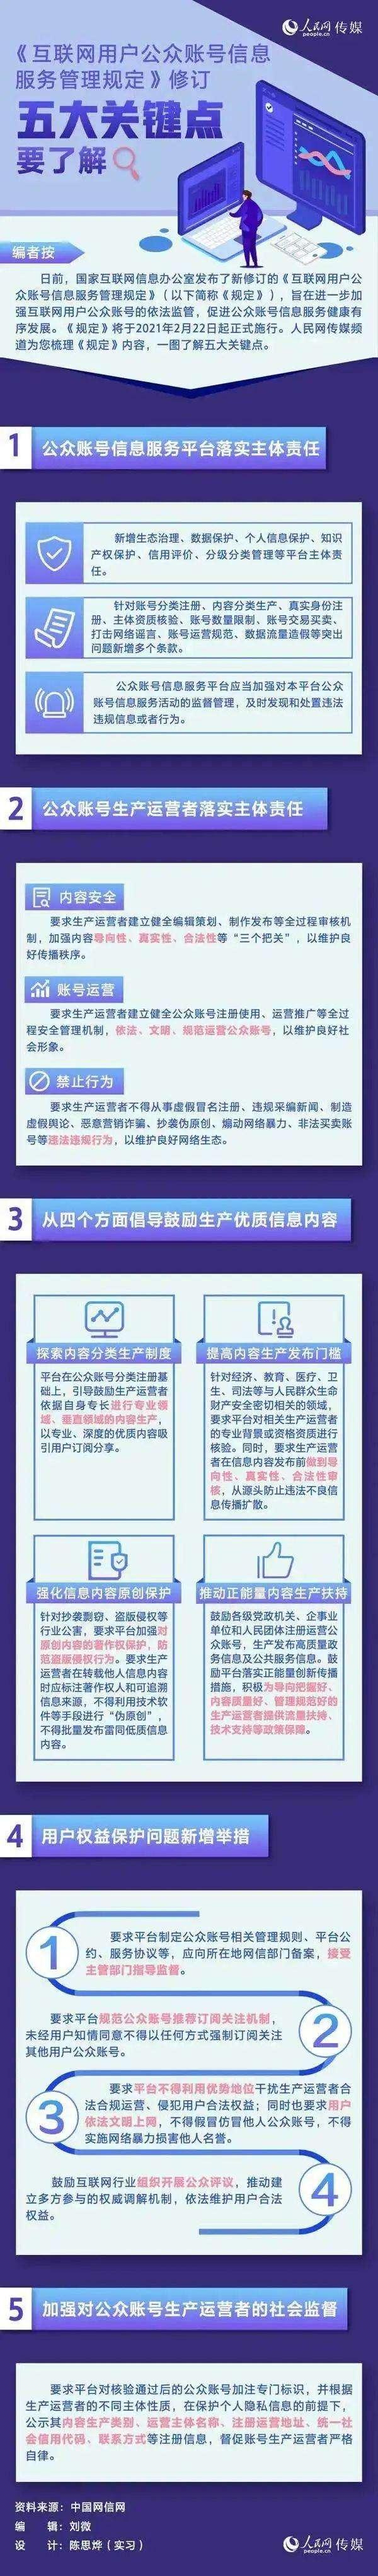 "<a href='https://www.zhouxiaohui.cn'><a href='https://www.zhouxiaohui.cn/duanshipin/'>视频号</a></a>直播的强提醒又升级了;自媒体人""呦呦鹿鸣""批评集体跪拜习俗被网暴   新榜情报-第3张图片-周小辉博客"